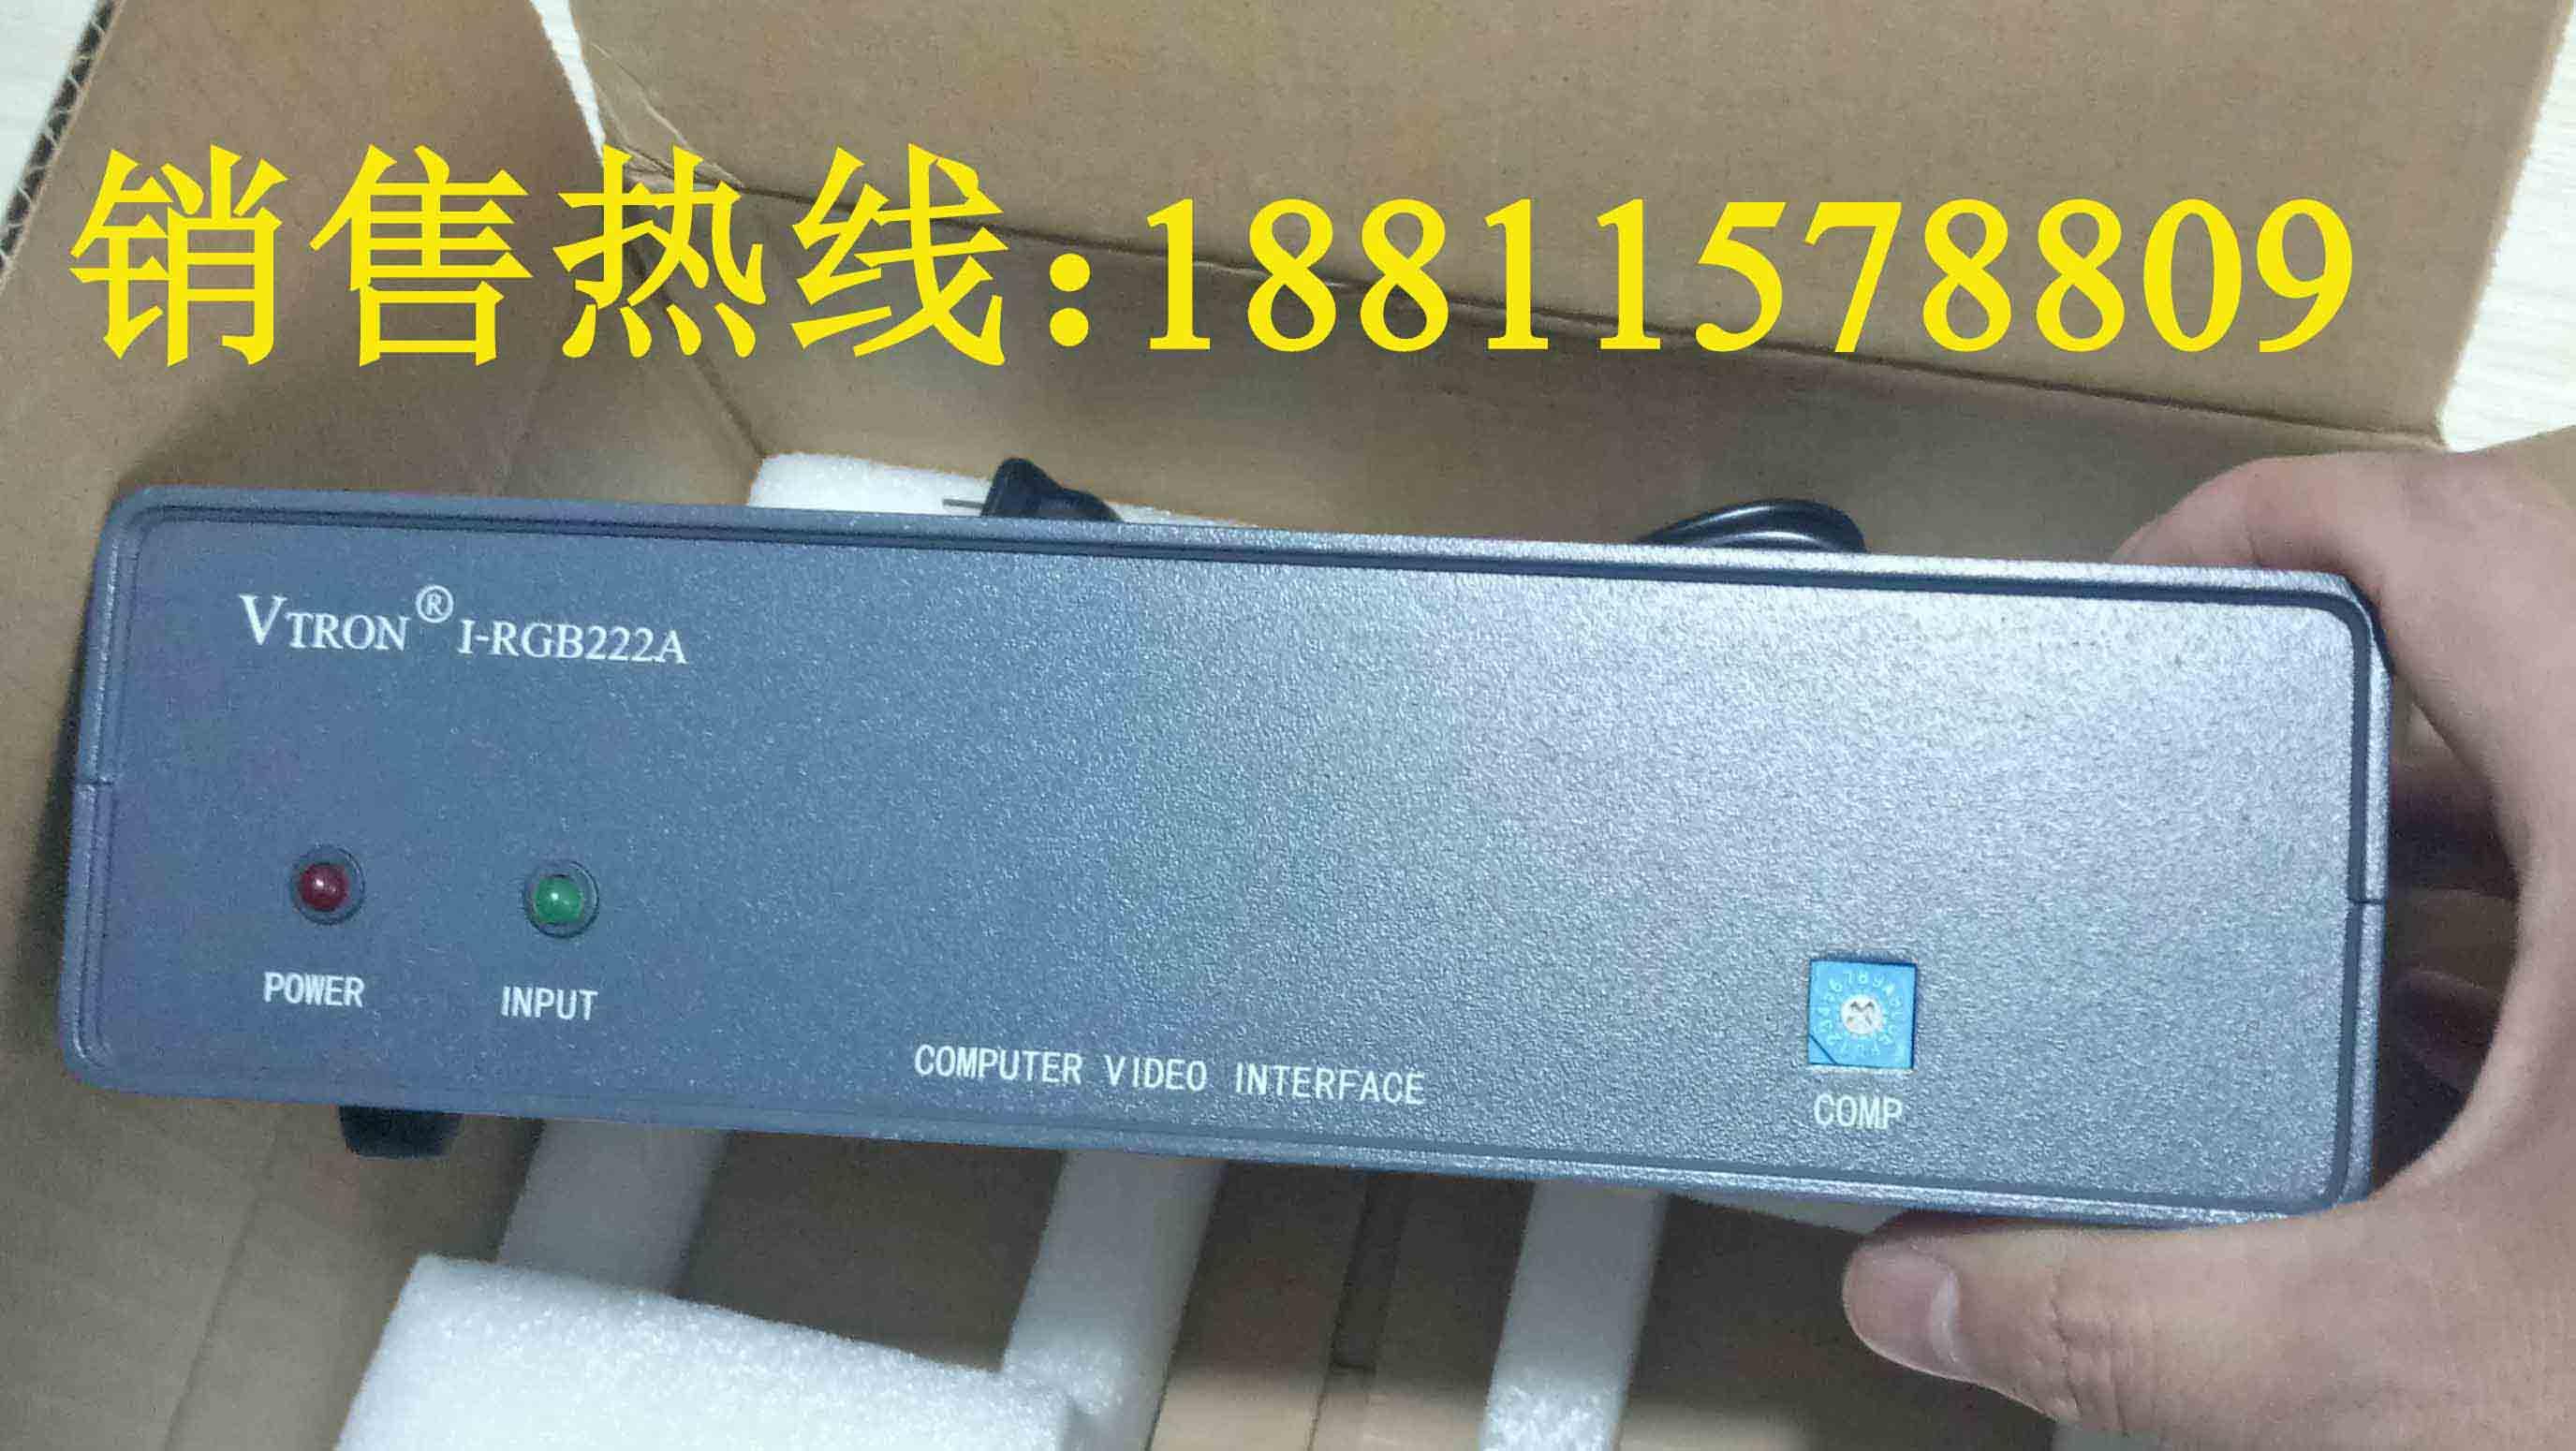 VTRON I-RGB222A